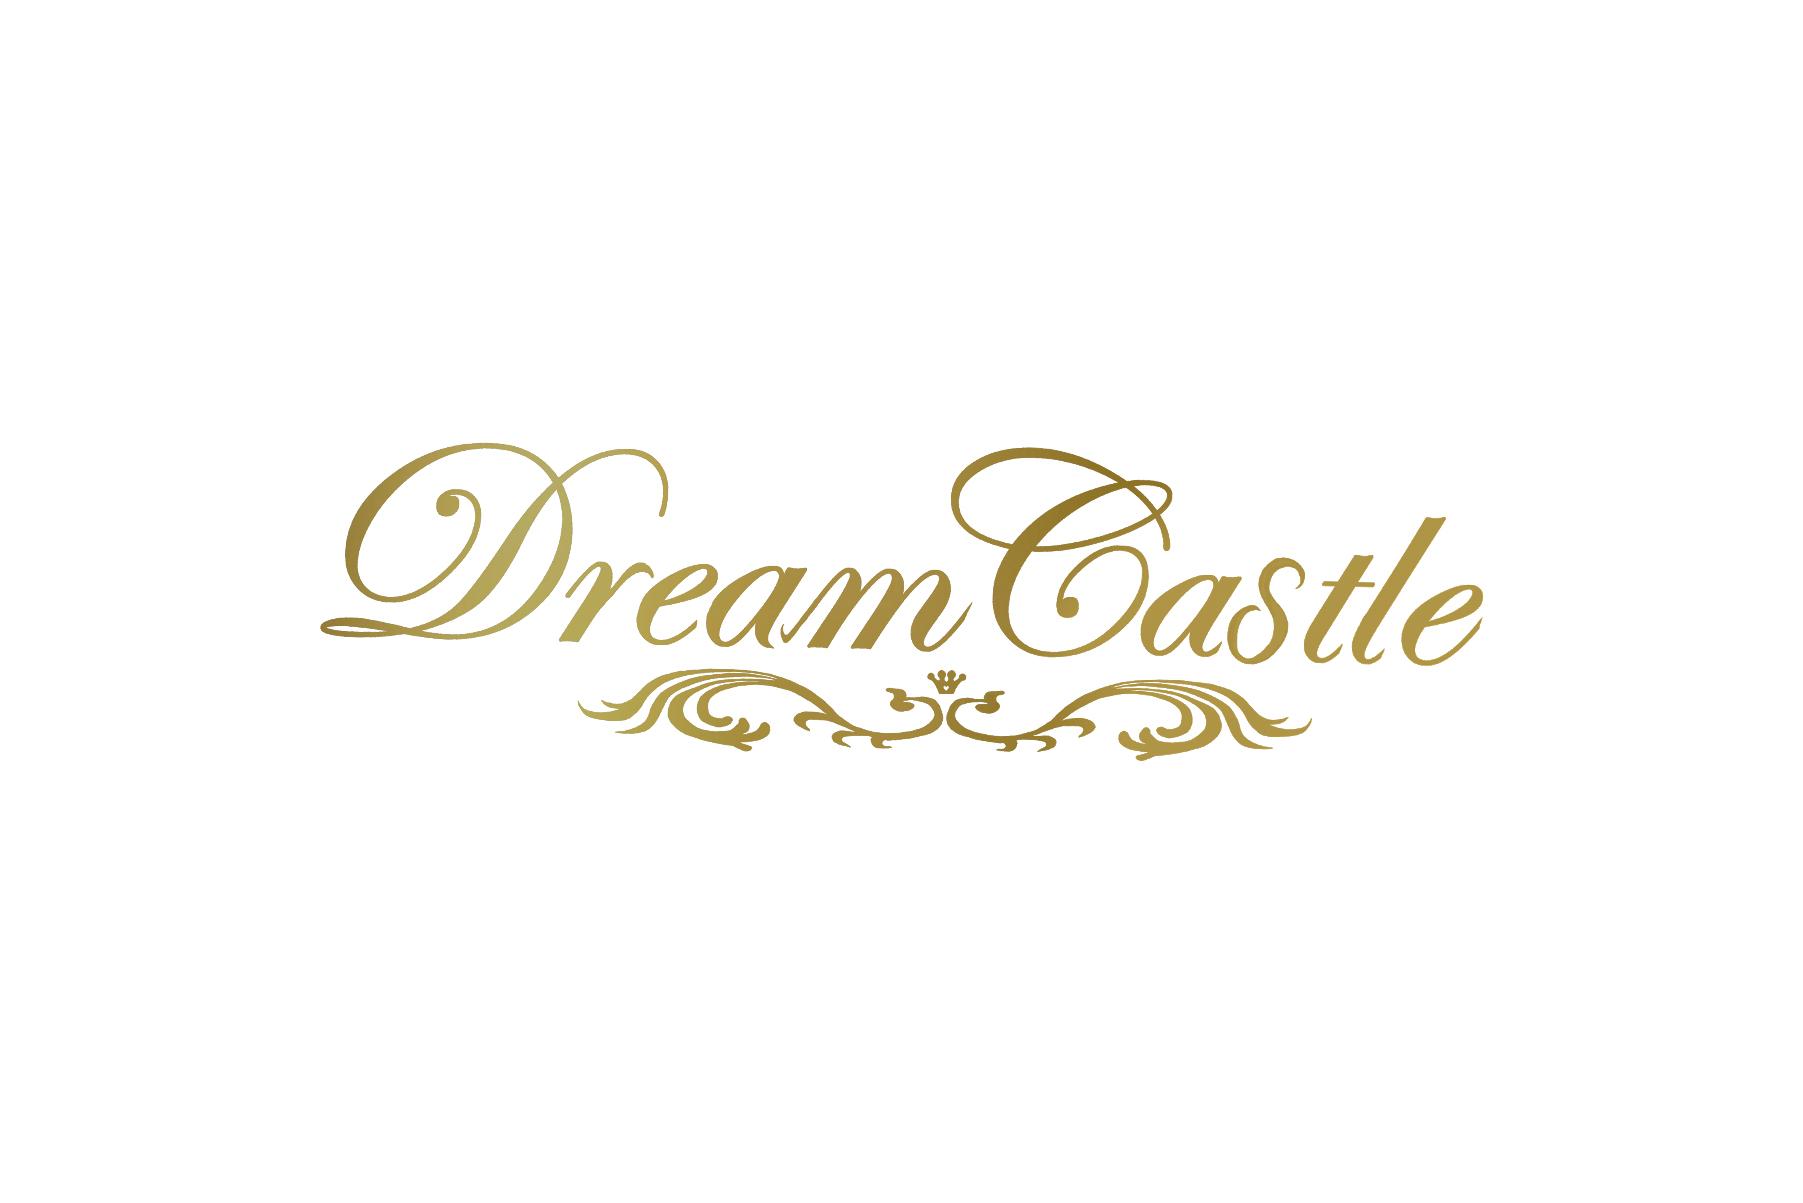 Dream Castle Event Venue